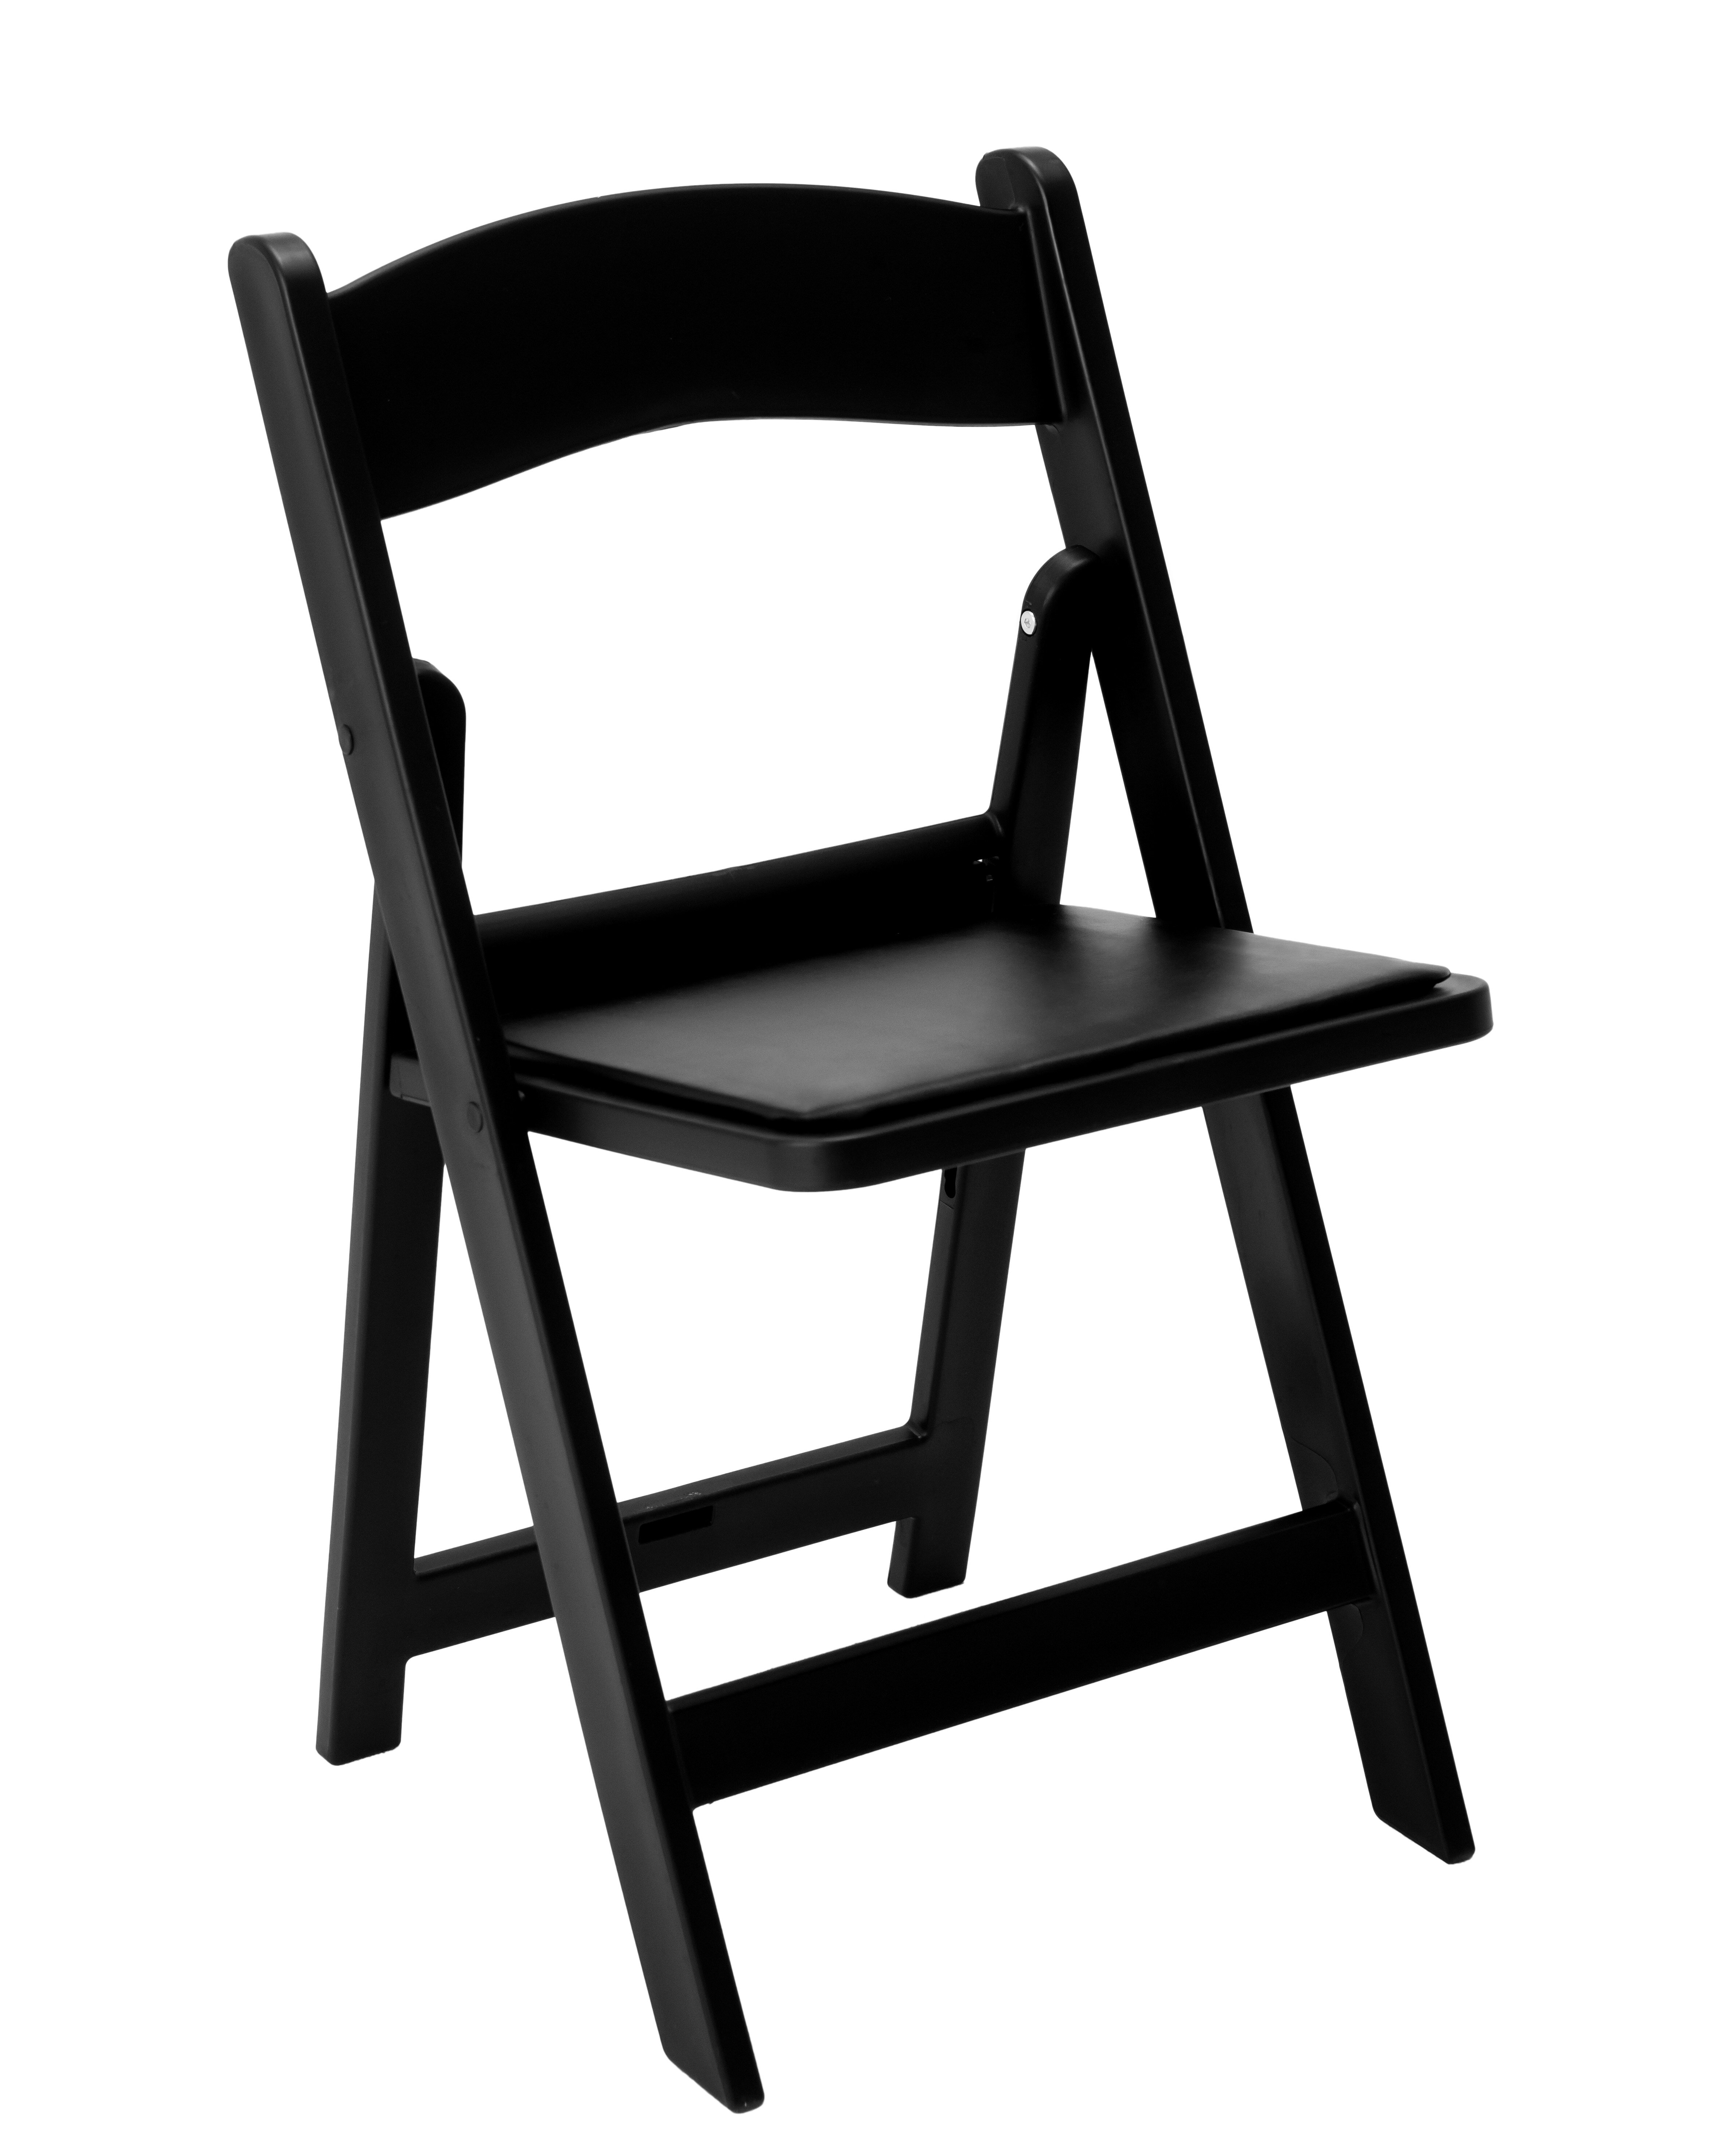 Attirant Lone Star Chairs Vinyl Padded Folding Chair U0026 Reviews | Wayfair